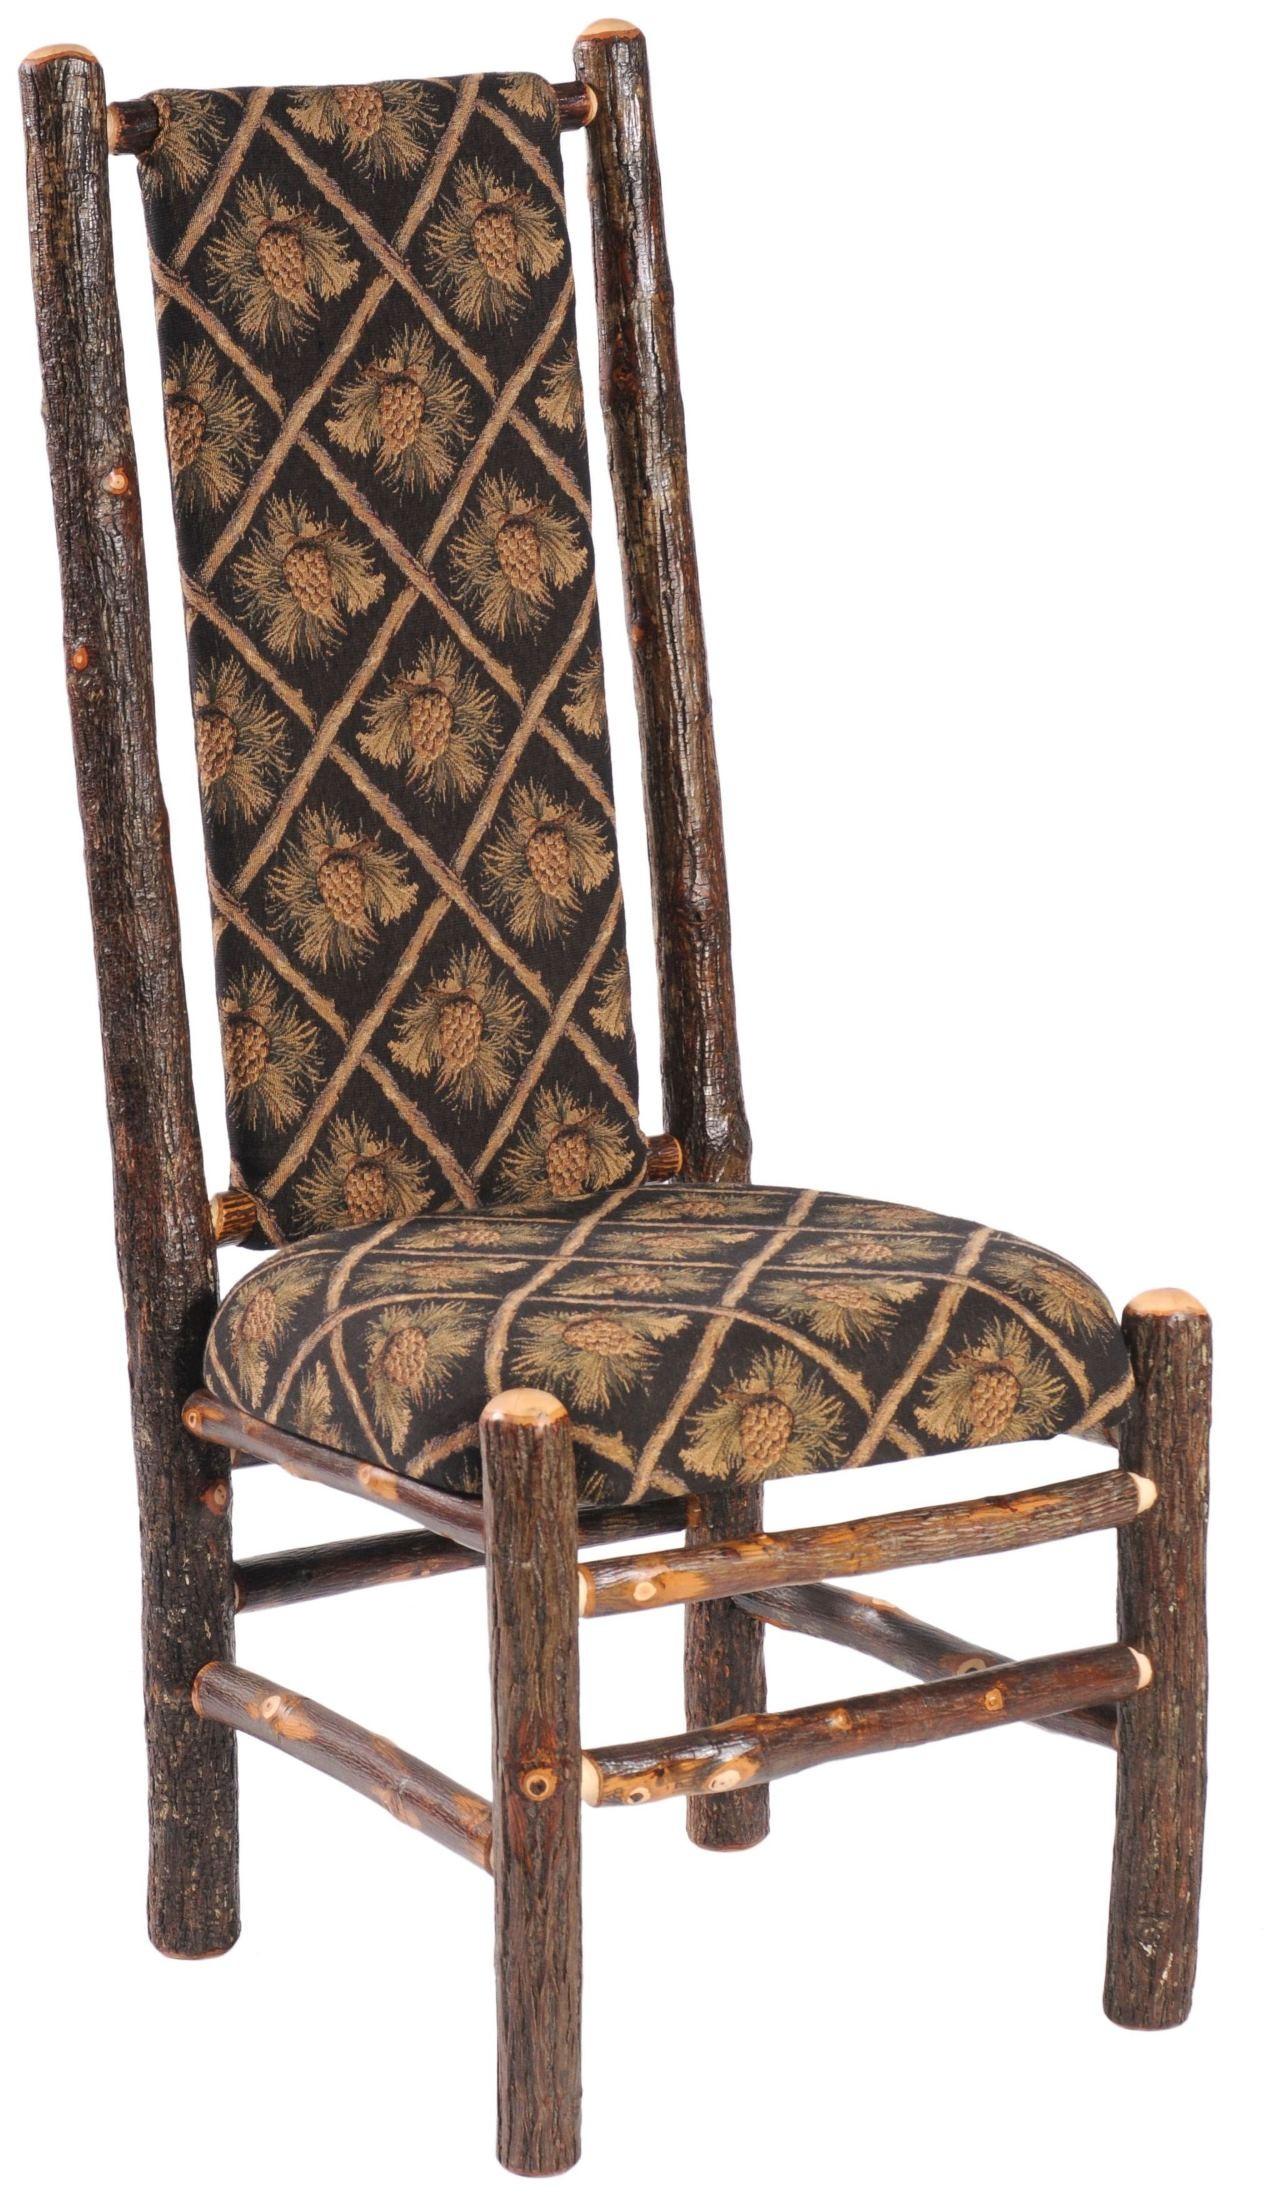 hickory standard fabric high back upholstered back side chair from fireside lodge 86070. Black Bedroom Furniture Sets. Home Design Ideas